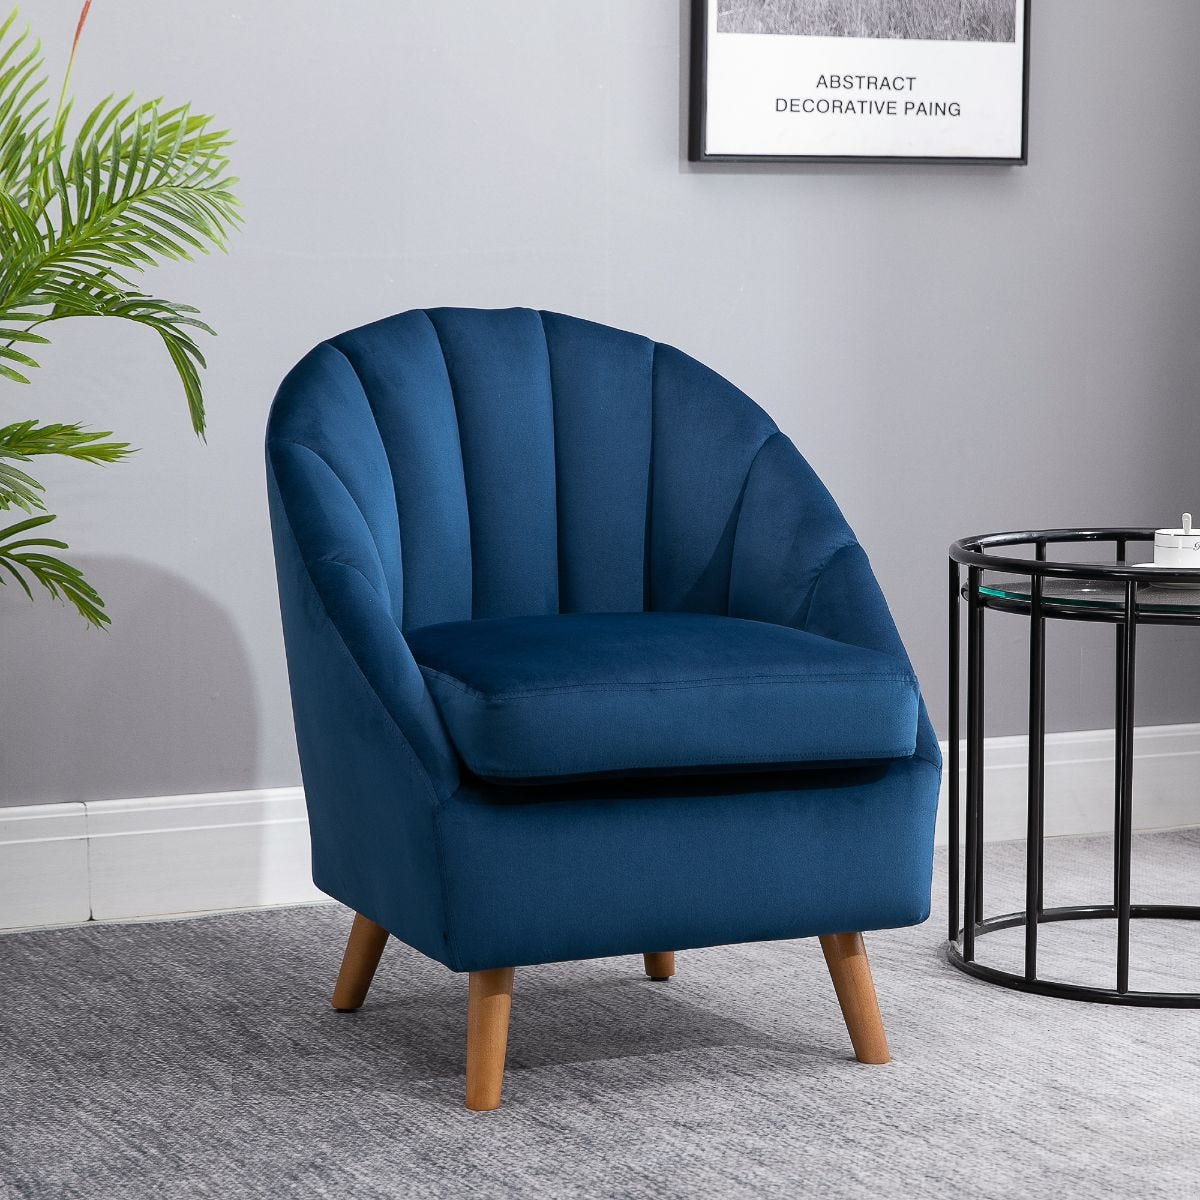 Shell Back Armchair Vintage Velvet Style Fabric Solid Wood Legs Blue